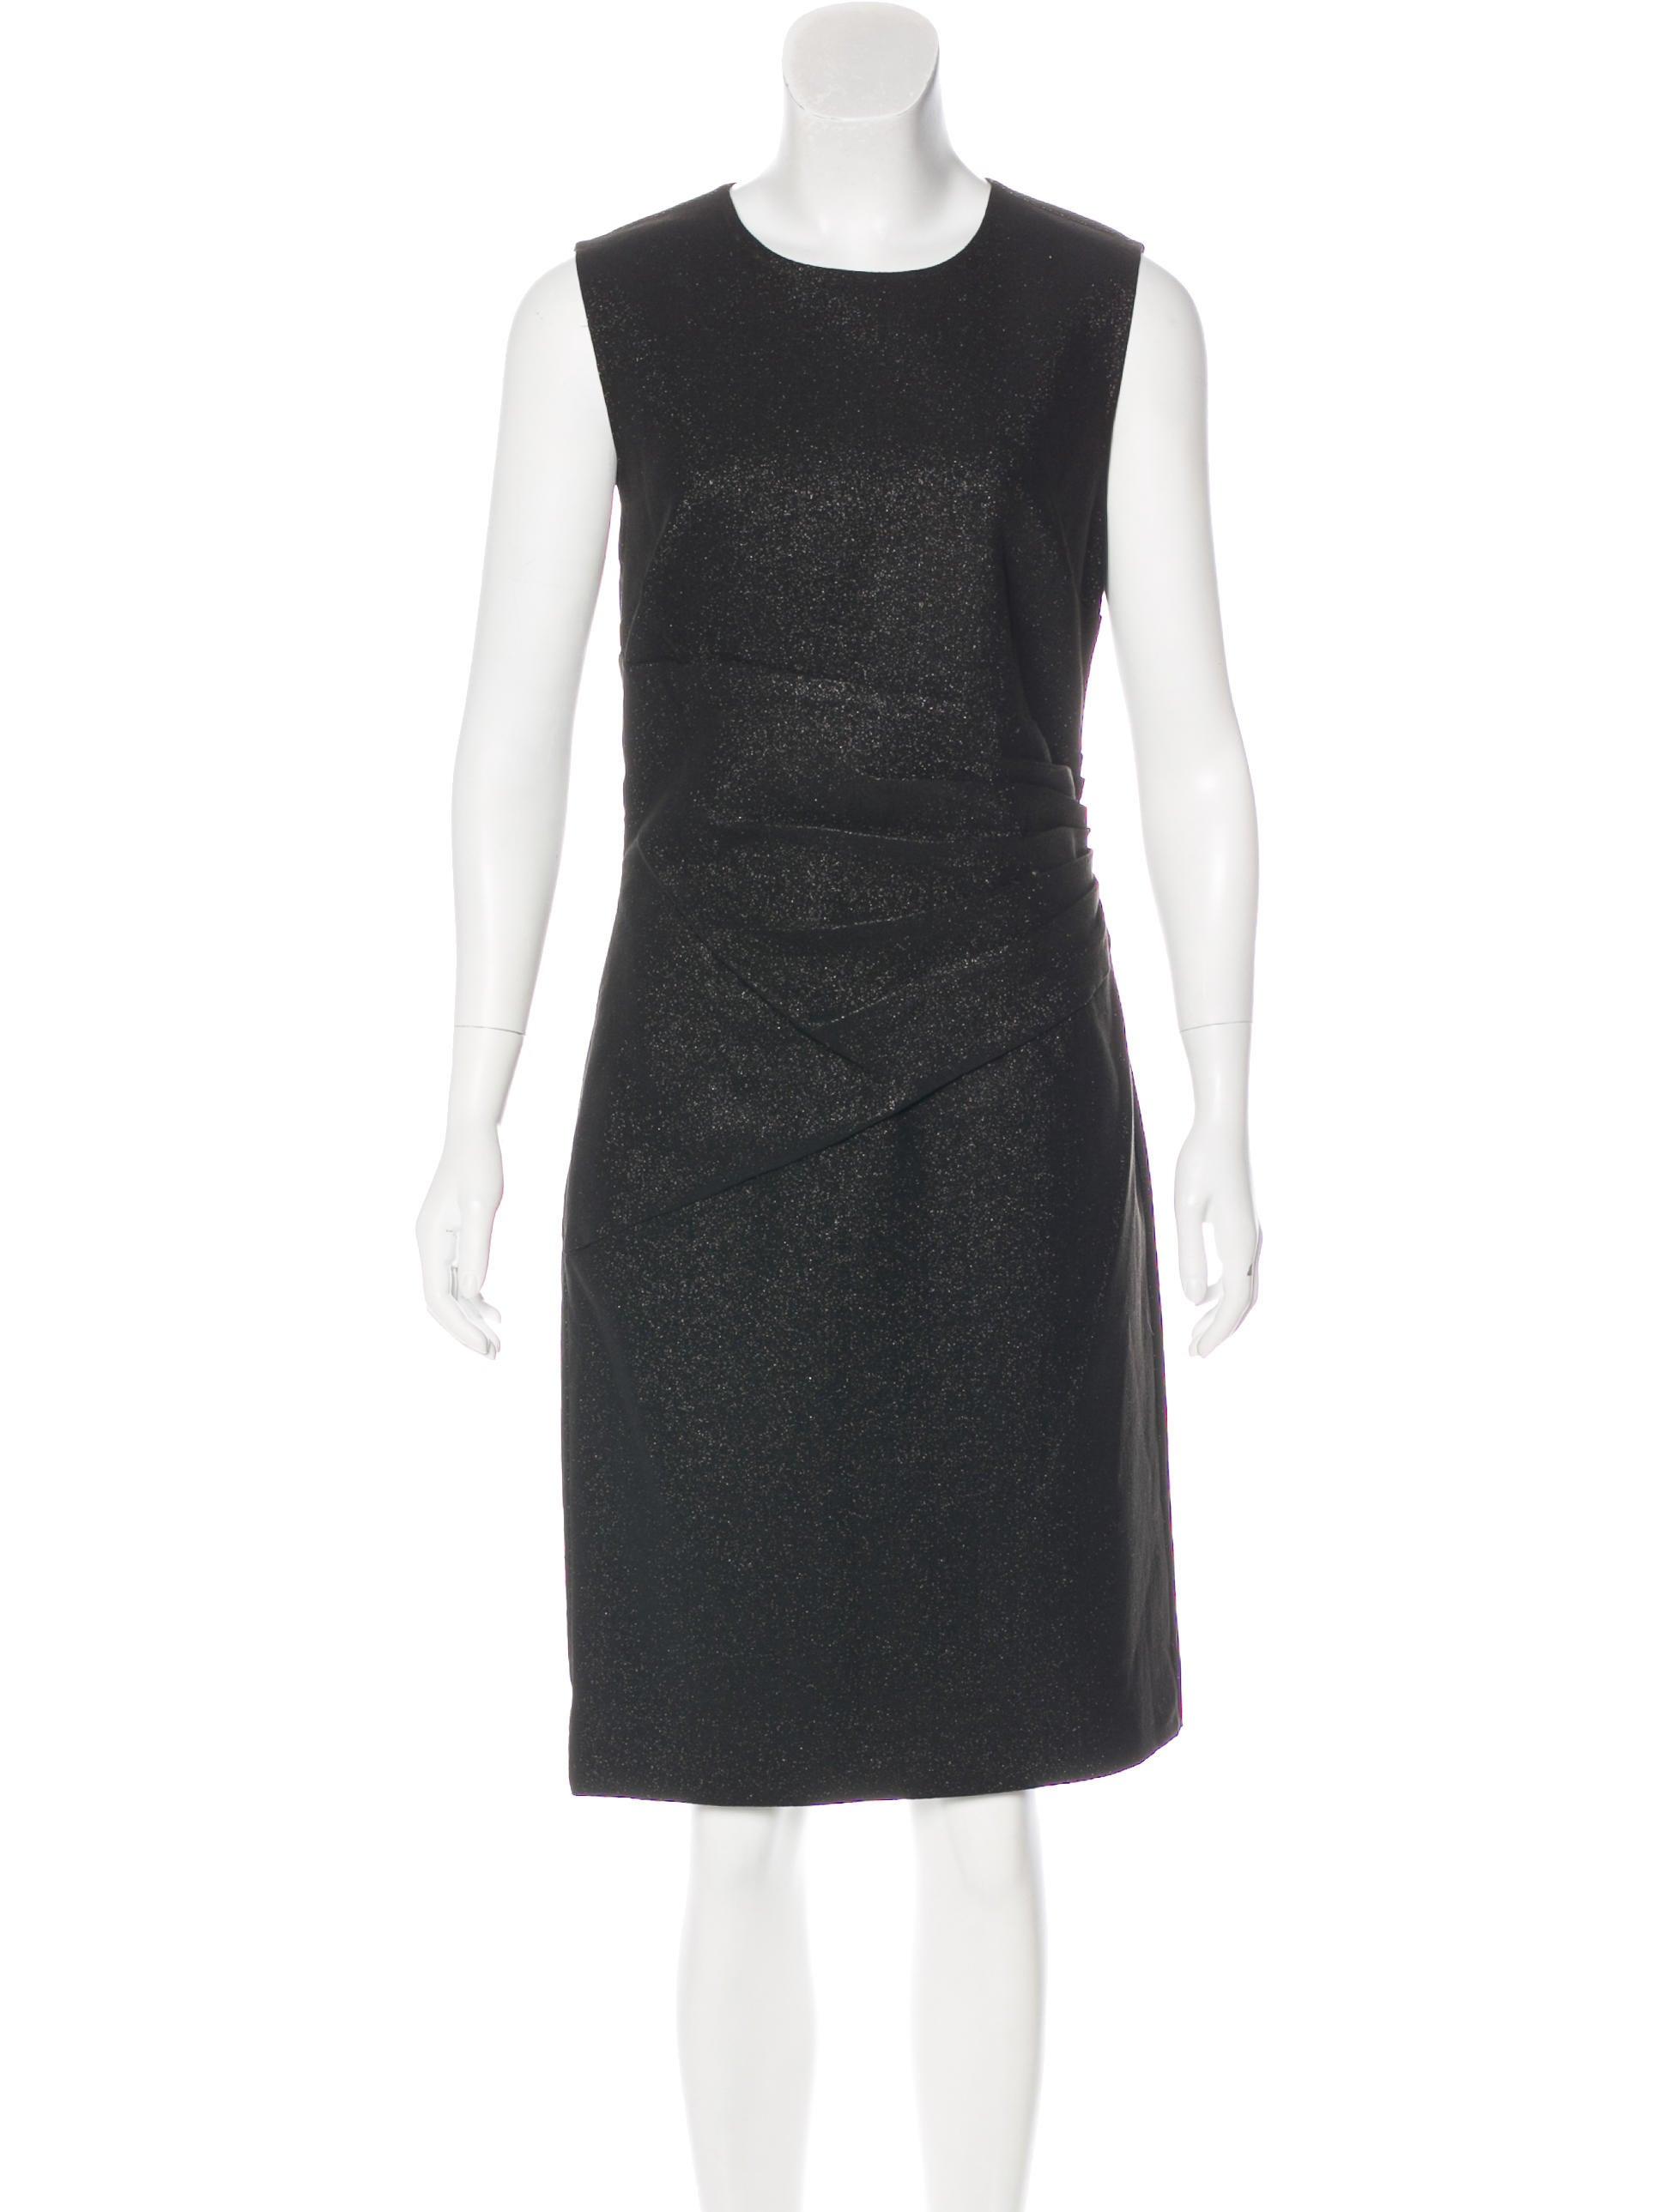 Diane von Furstenberg Sleeveless Midi Dress w/ Tags Cheap Official M2ksWJk